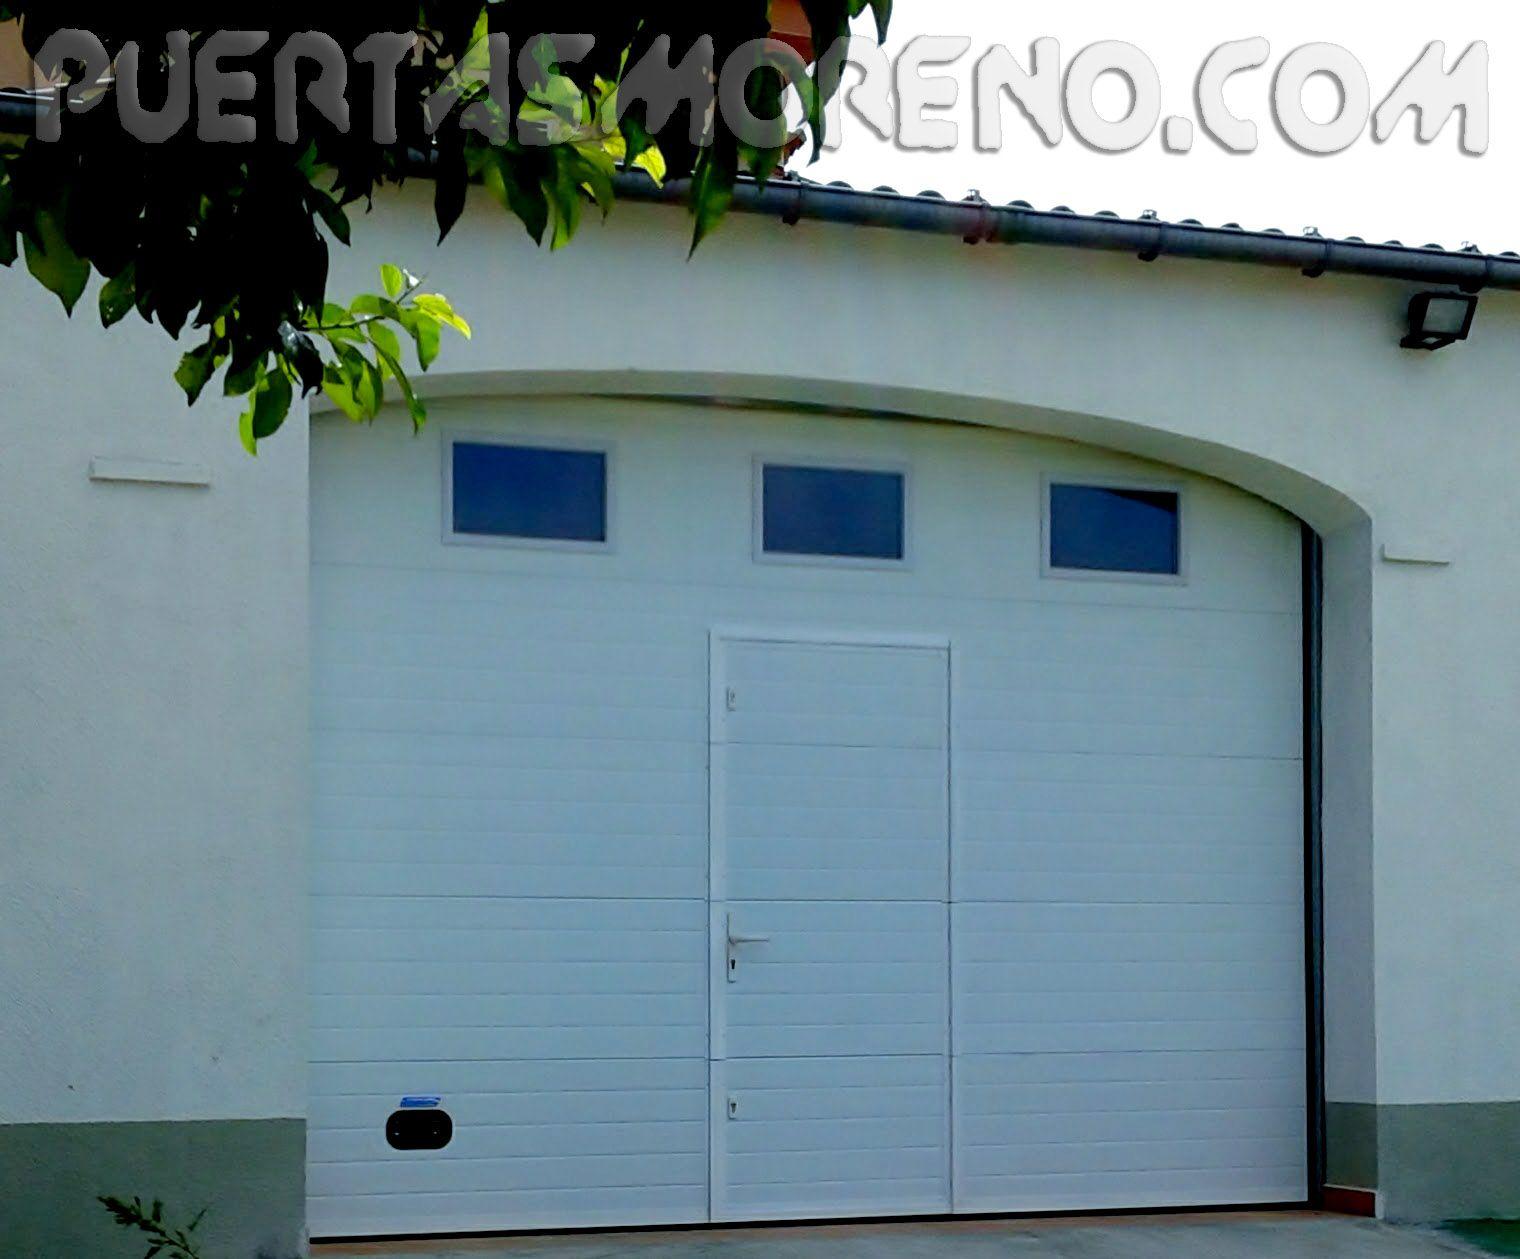 Puerta Seccional Con Puerta Peatonal Incorporada Seccional Puertaseccional Automatismo Puertaautomática A Puertas Automaticas Puertas Interiores Puertas